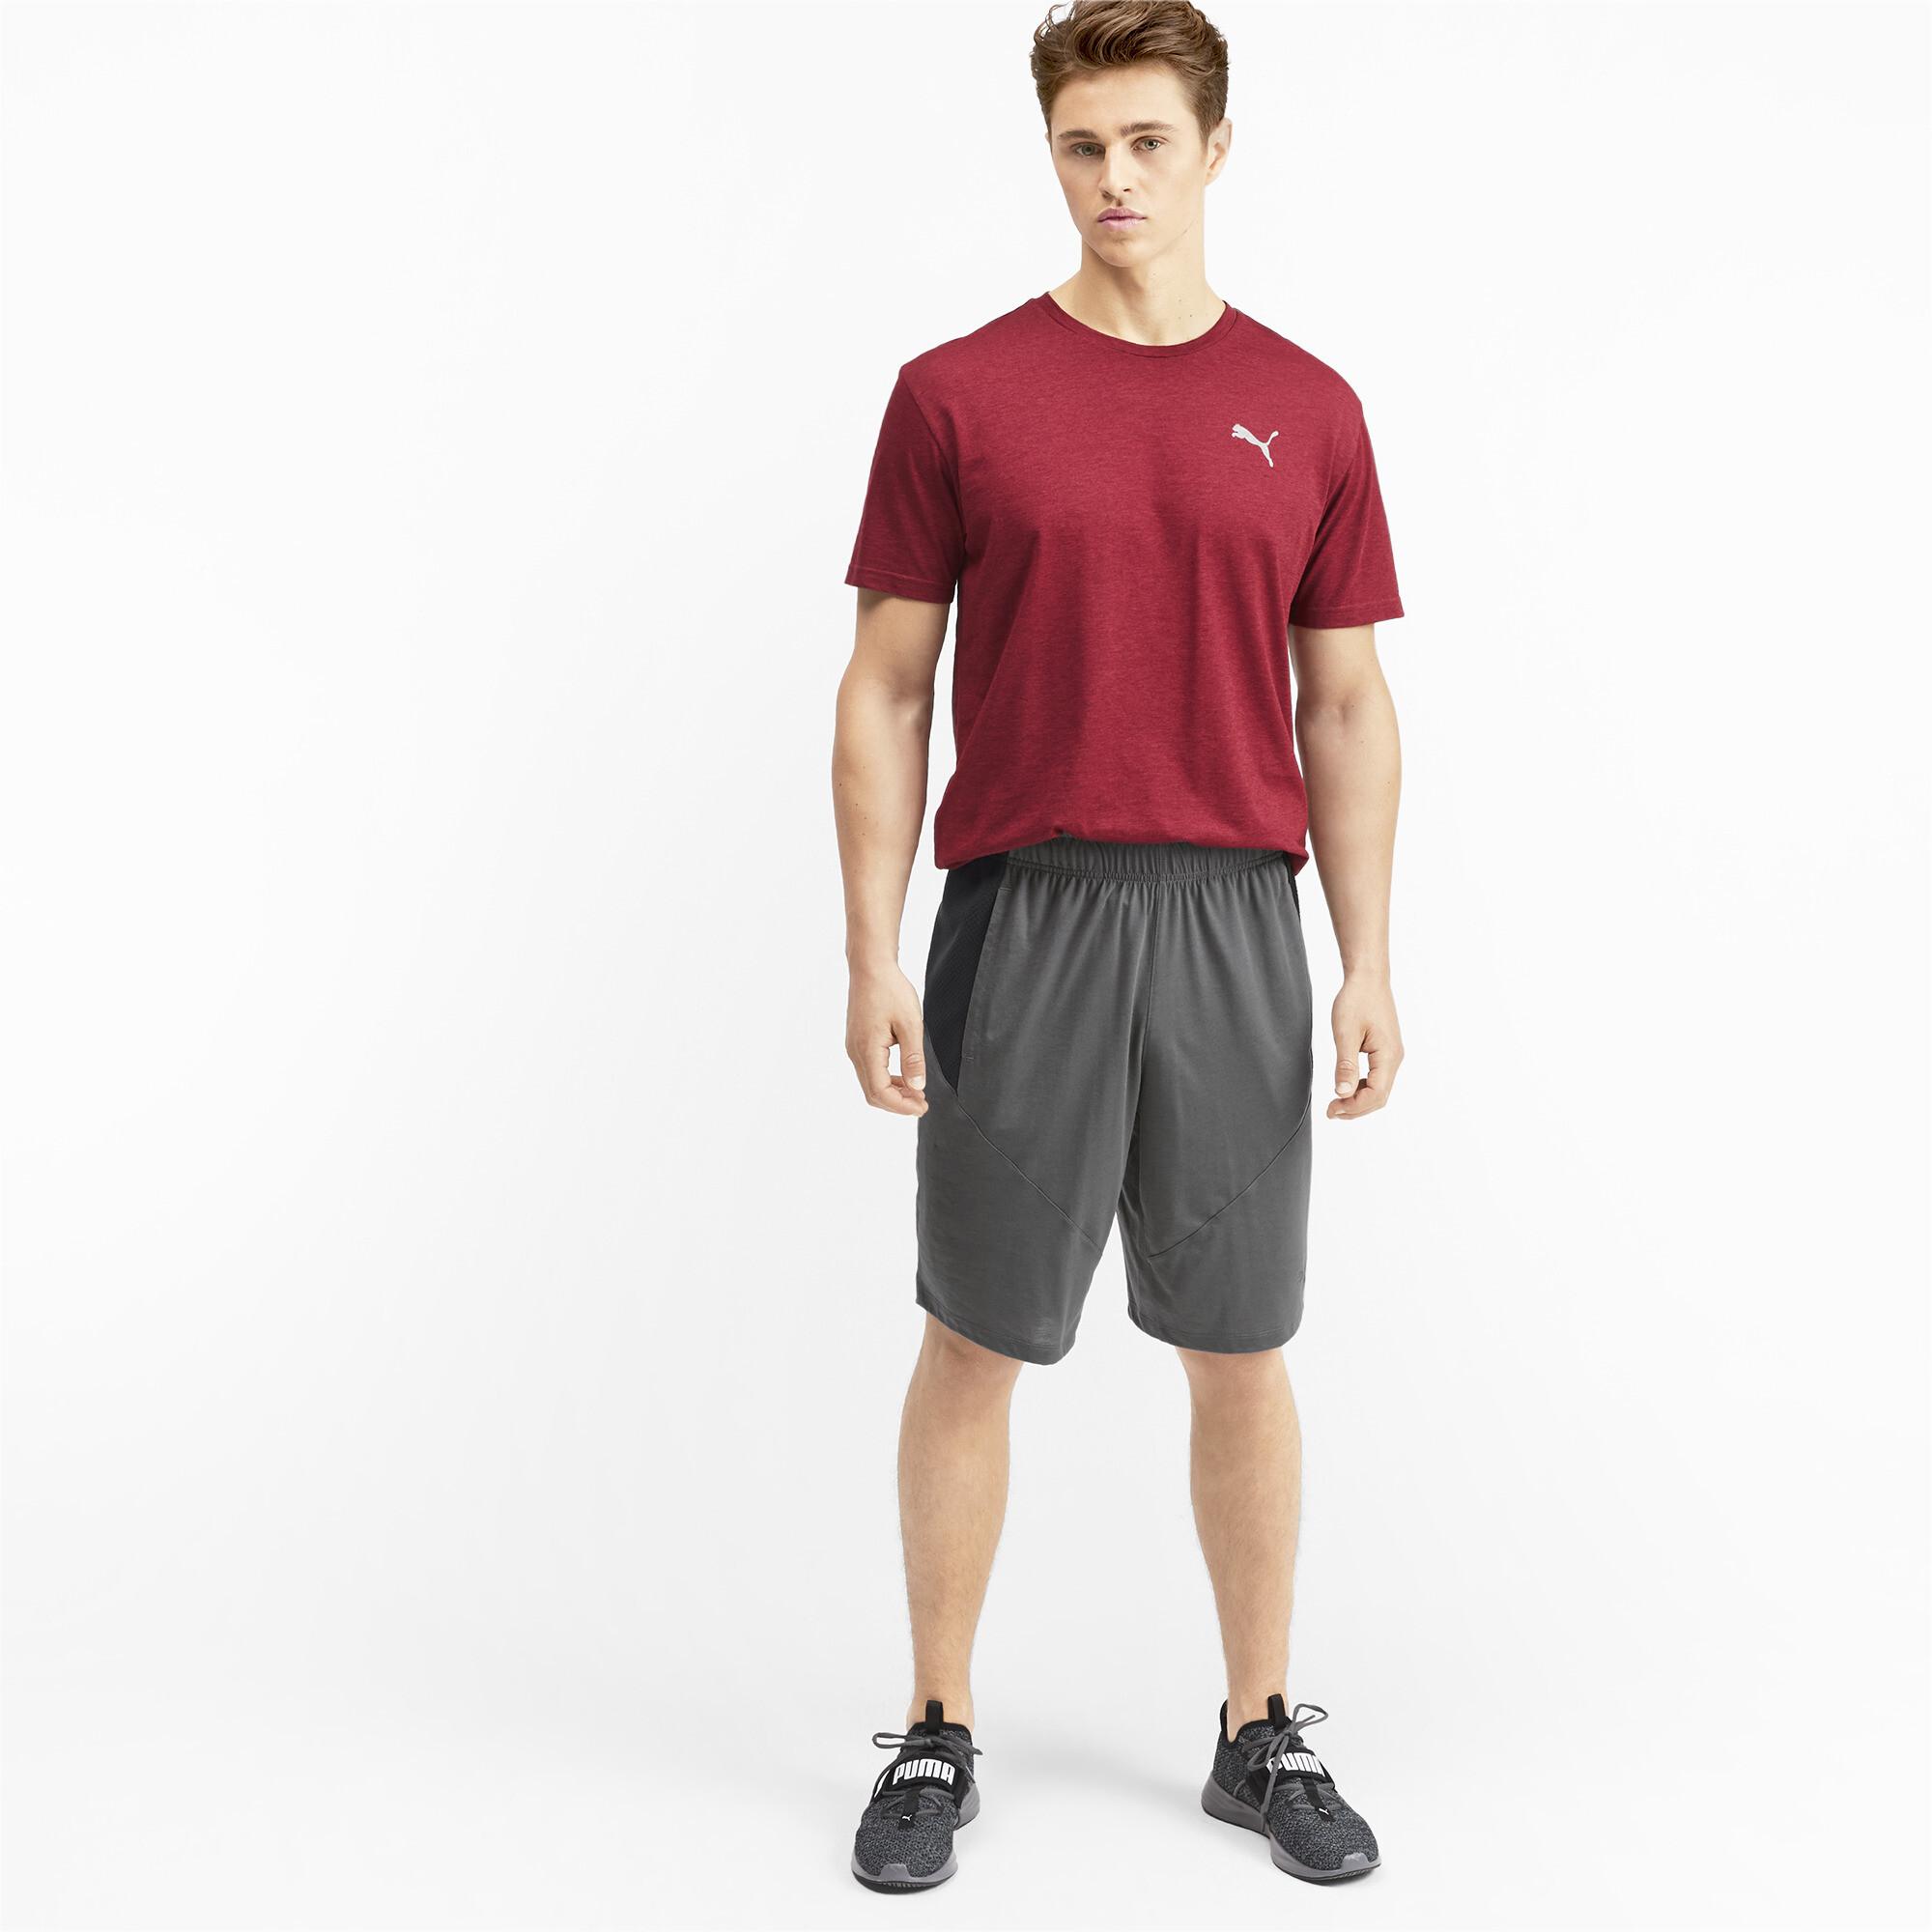 PUMA-Reactive-Drirelease-Men-039-s-Shorts-Men-Knitted-Shorts-Training thumbnail 6